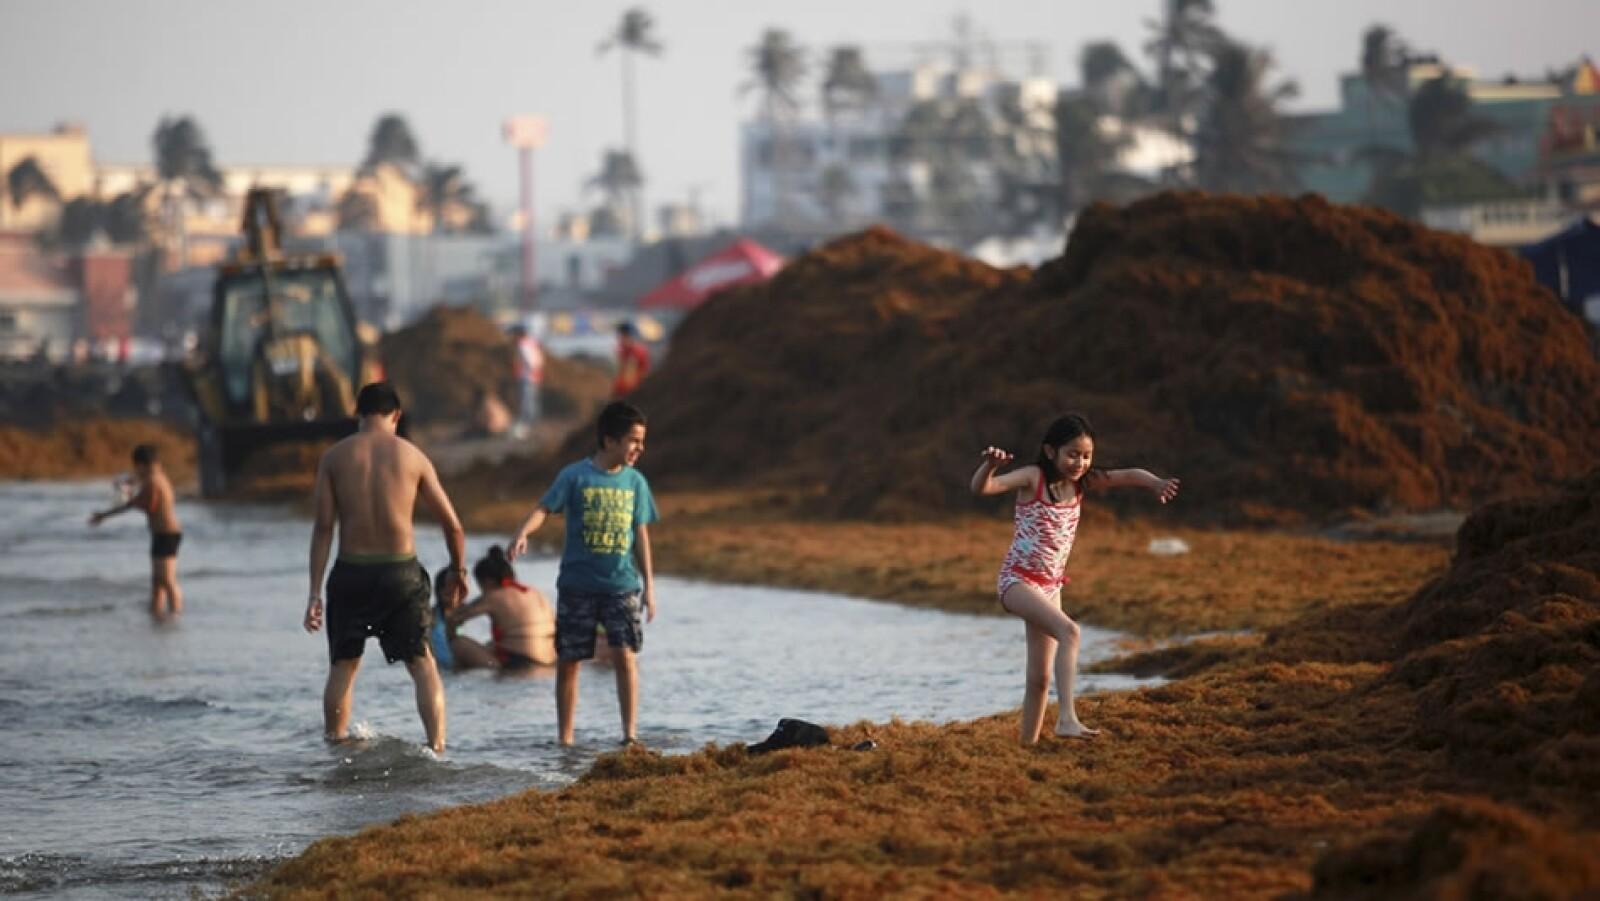 playa veracruz algas